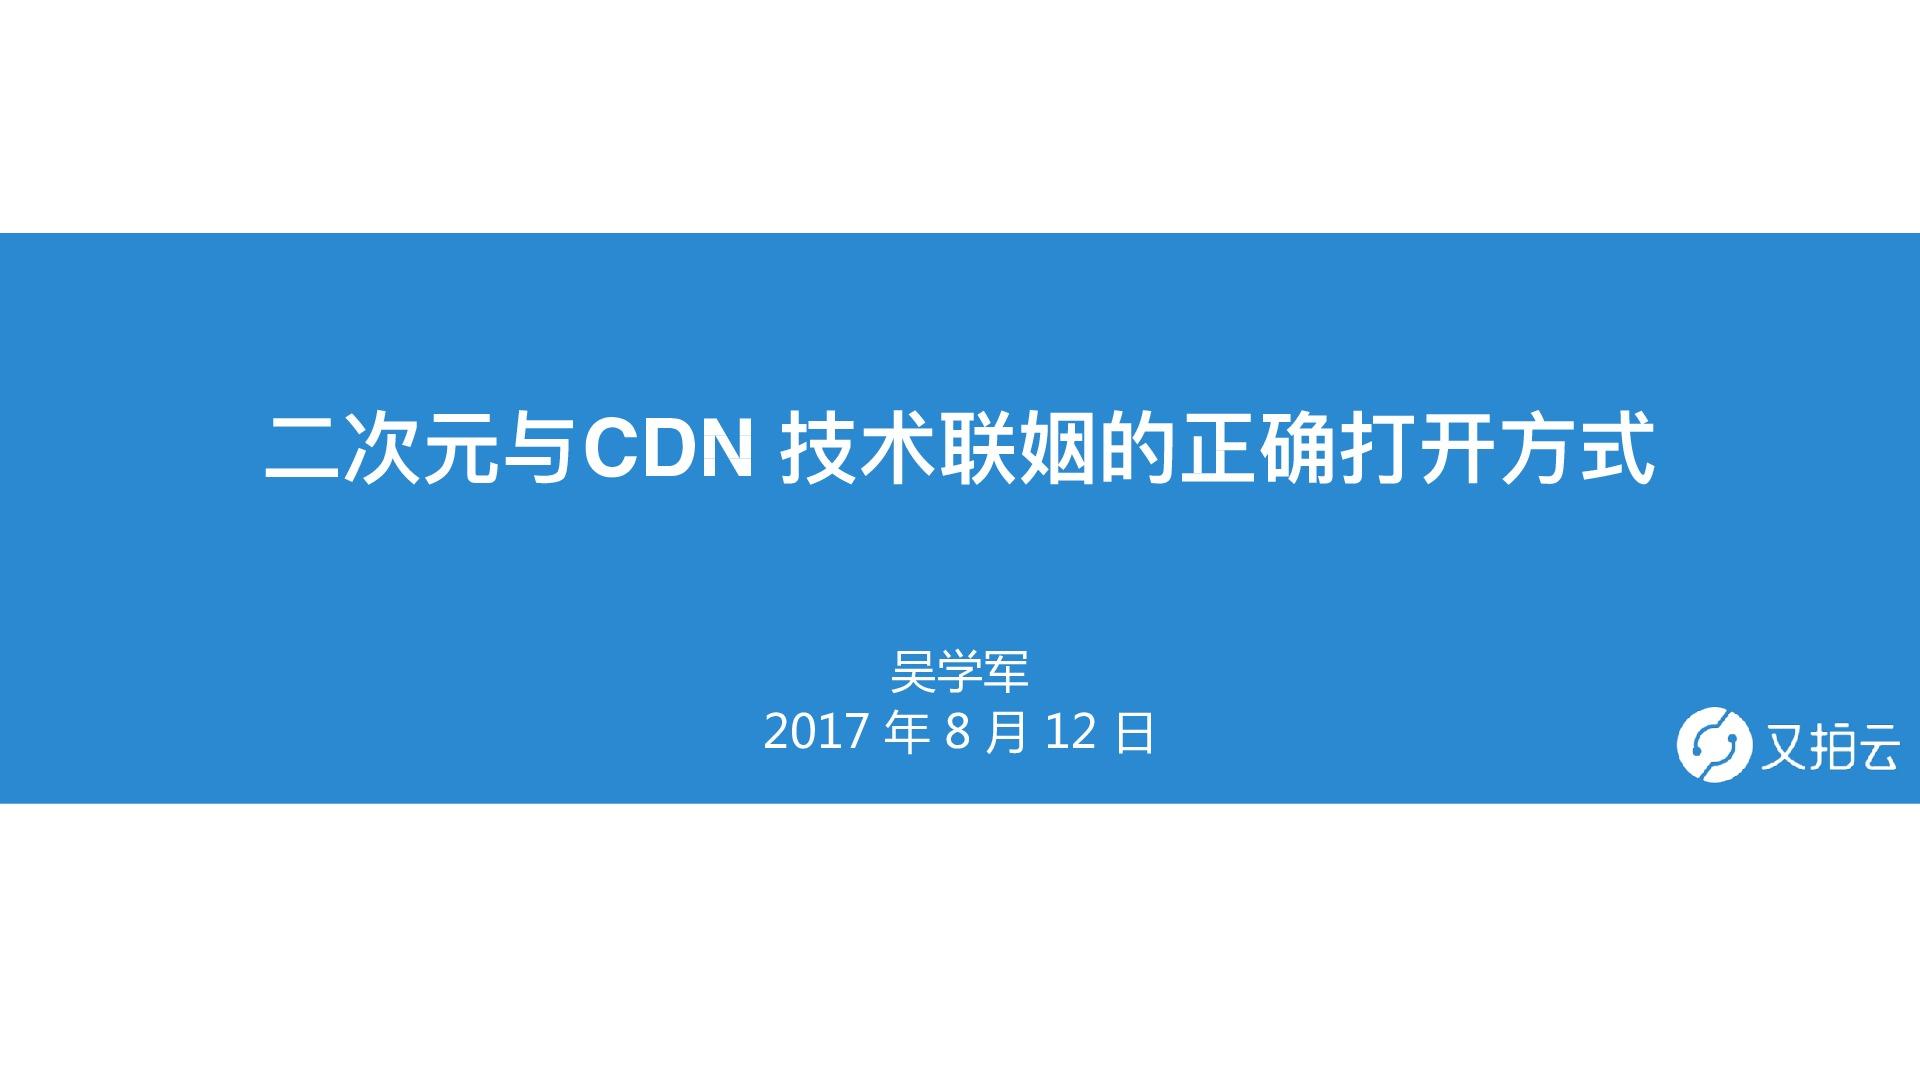 https://opentalk-blog.b0.upaiyun.com/prod/2017-10-31/55ac1fe574cf0d22a266421978ded7fb